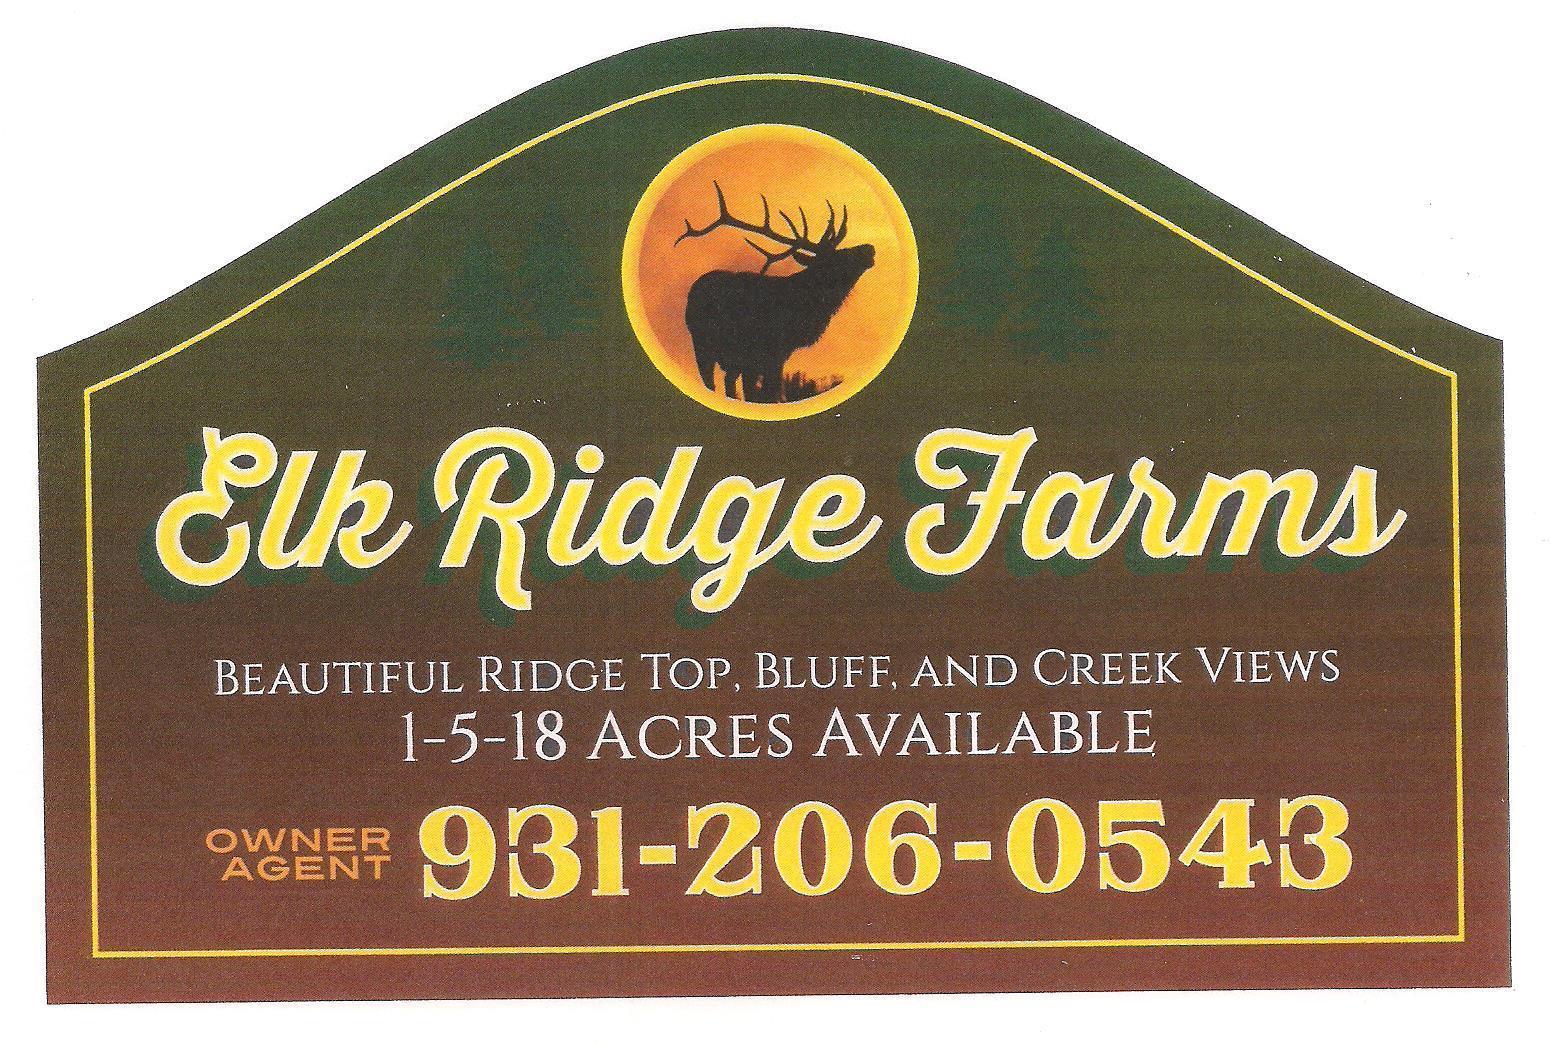 45 ELK RIDGE ROAD, Cumberland City, TN 37050